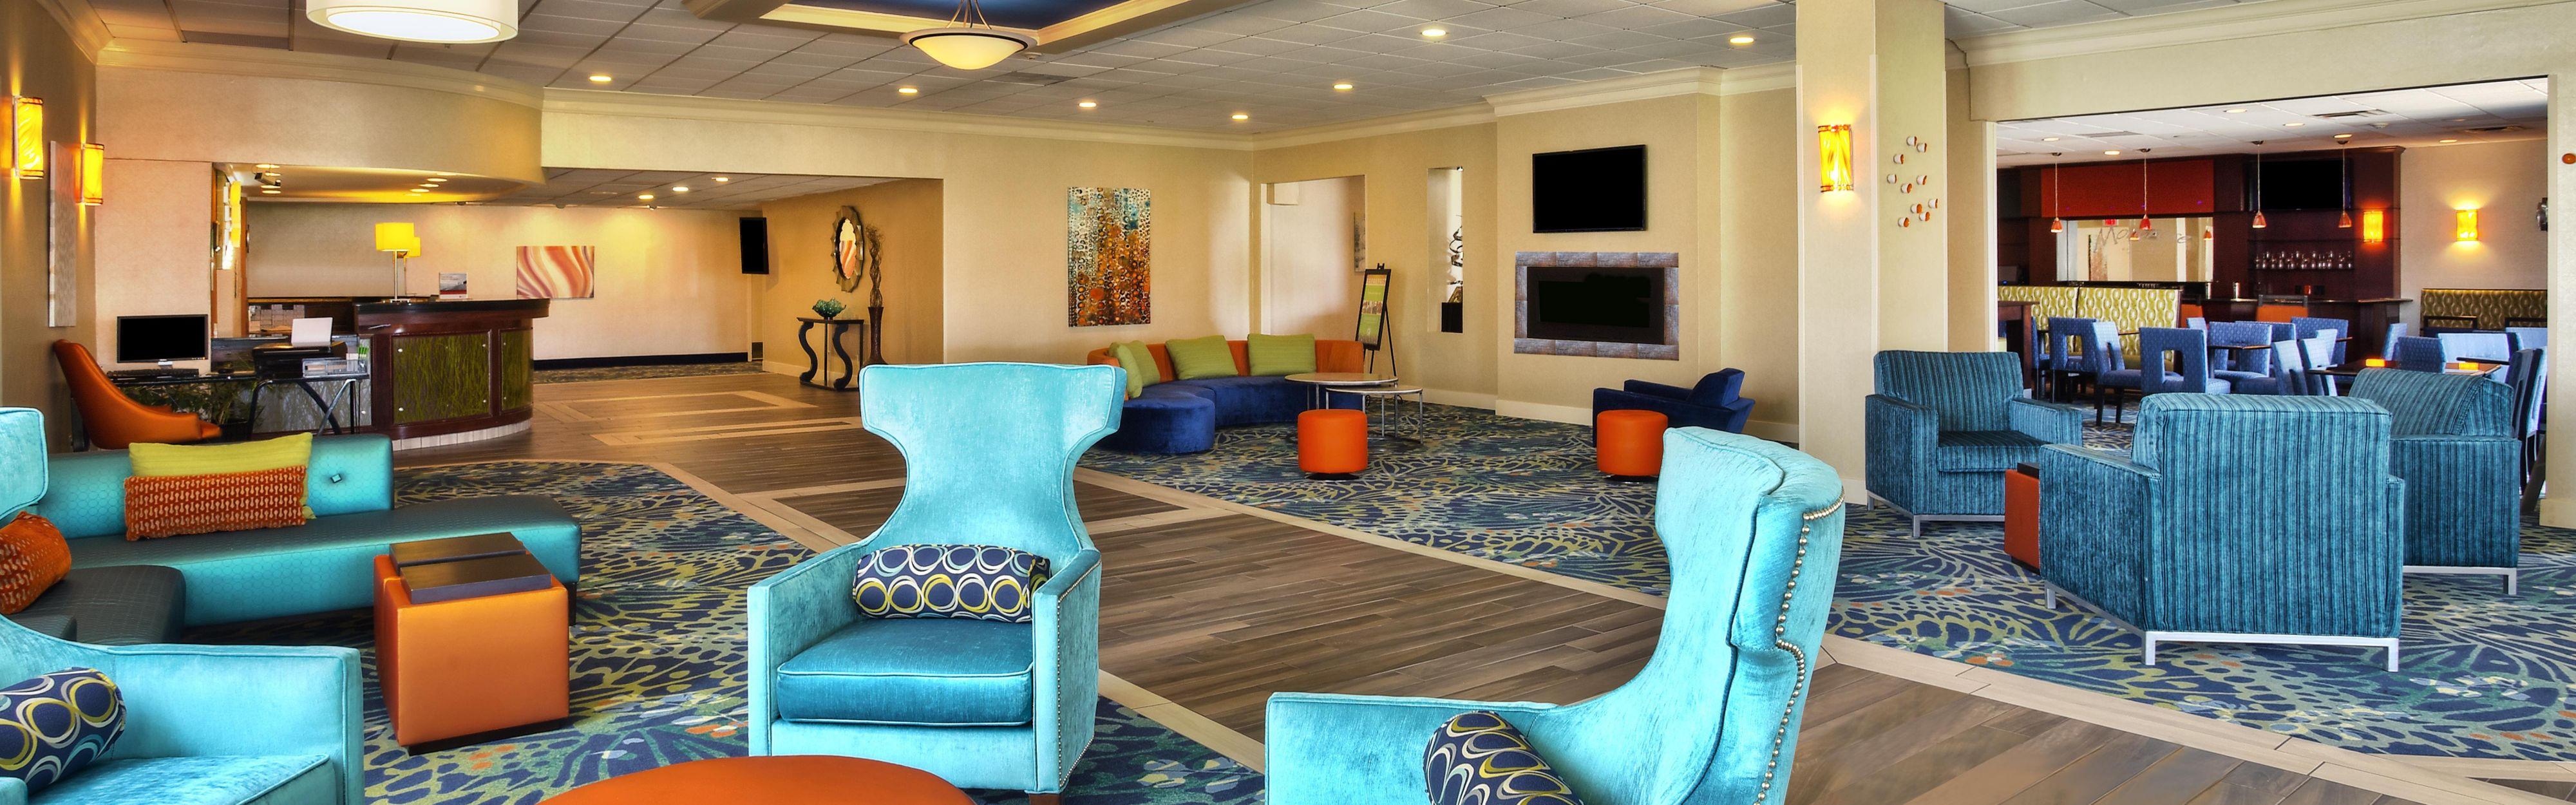 Holiday Inn Akron West - Fairlawn image 0